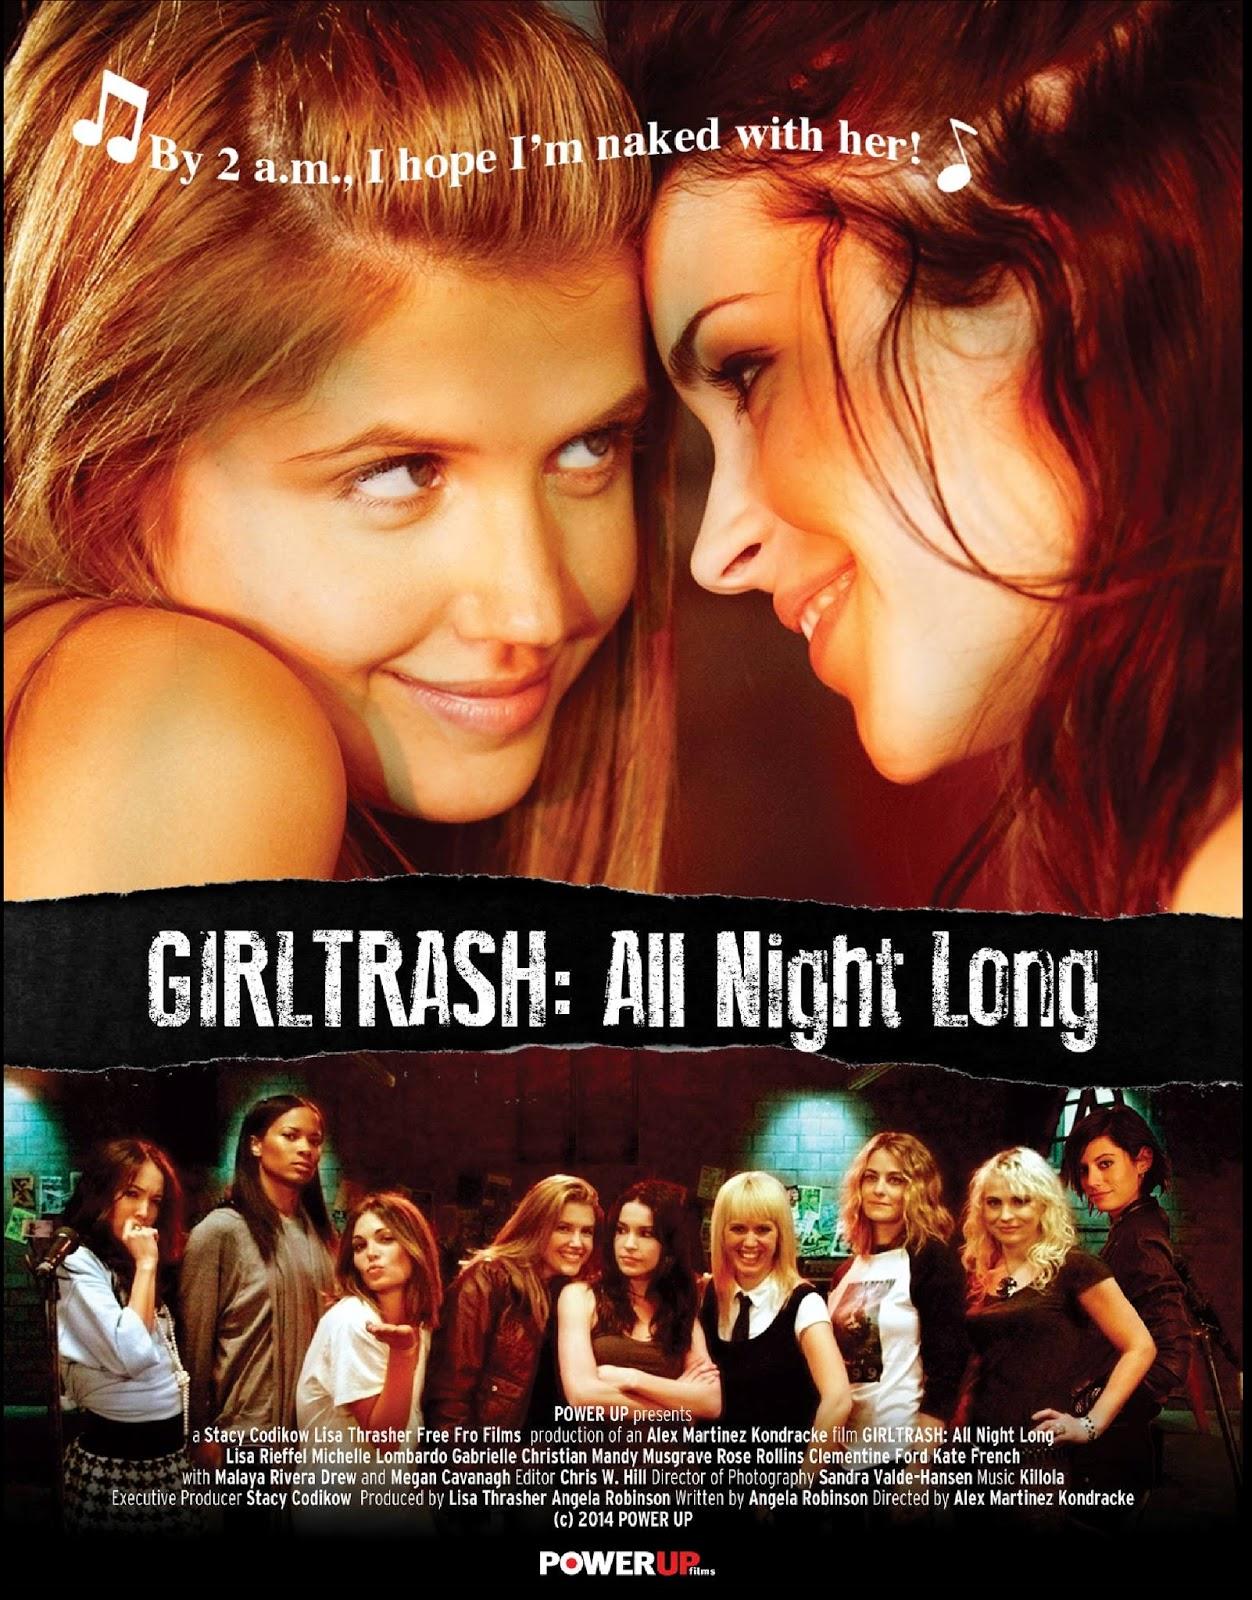 lesbian girls movie Jamie Babbit's film seems.